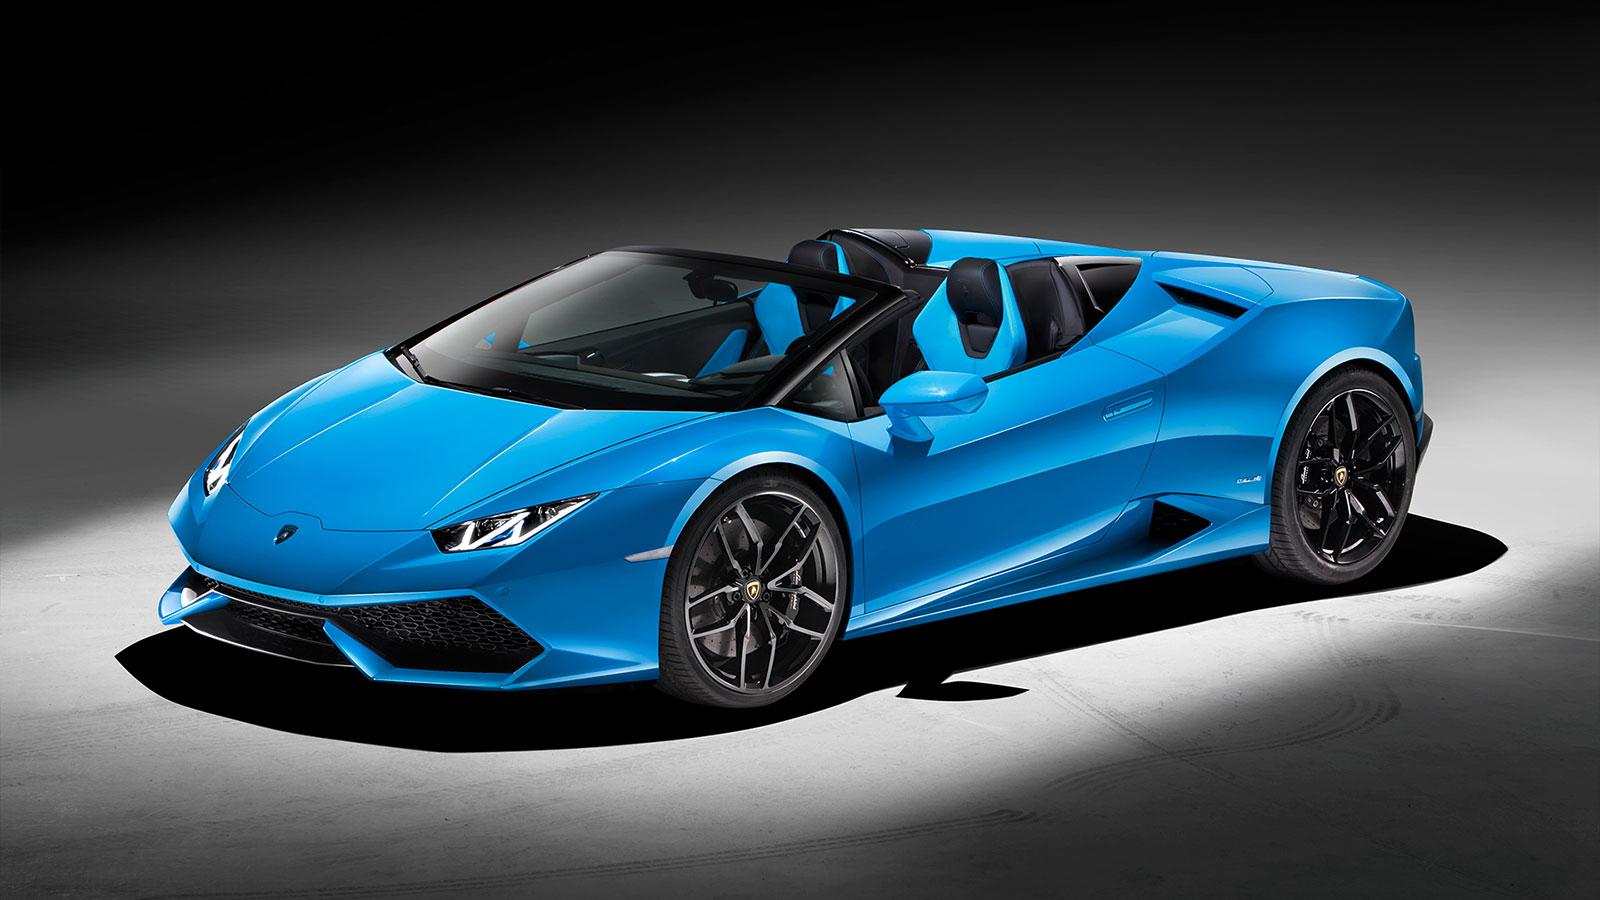 Lamborghini Huracan AWD Spyder - Inspiring Technology image 12